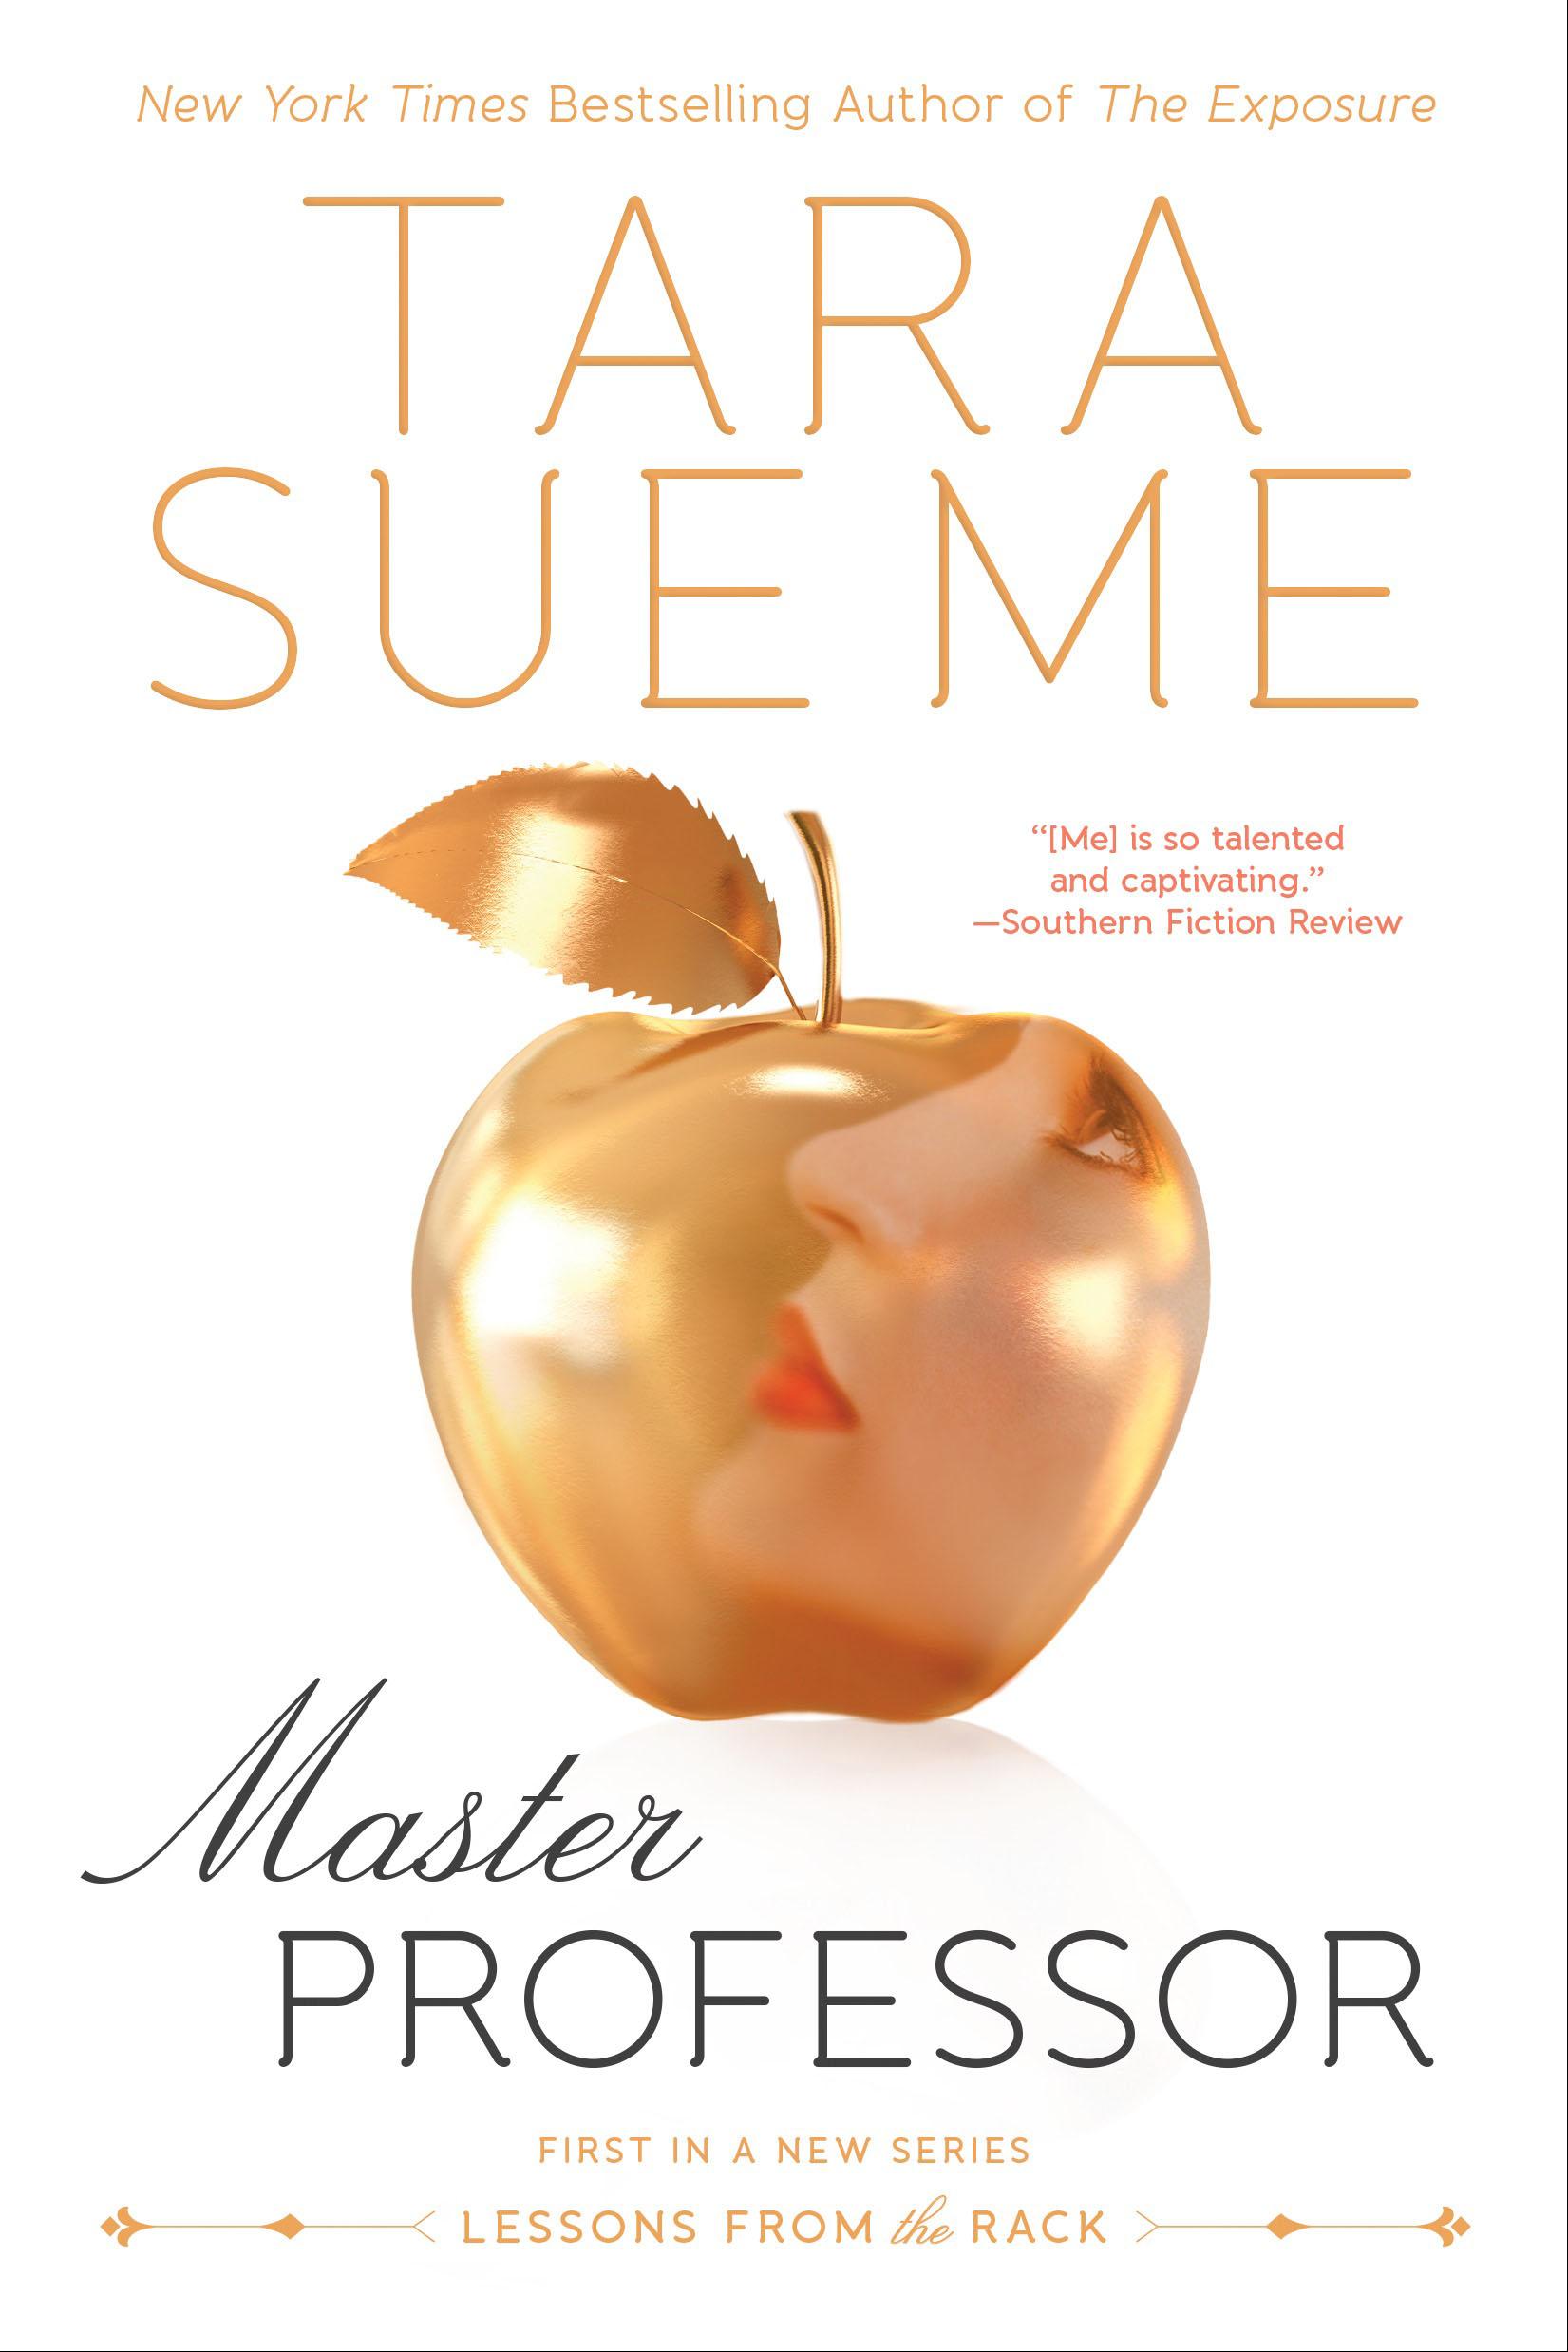 Master Professor master control 115x180cm